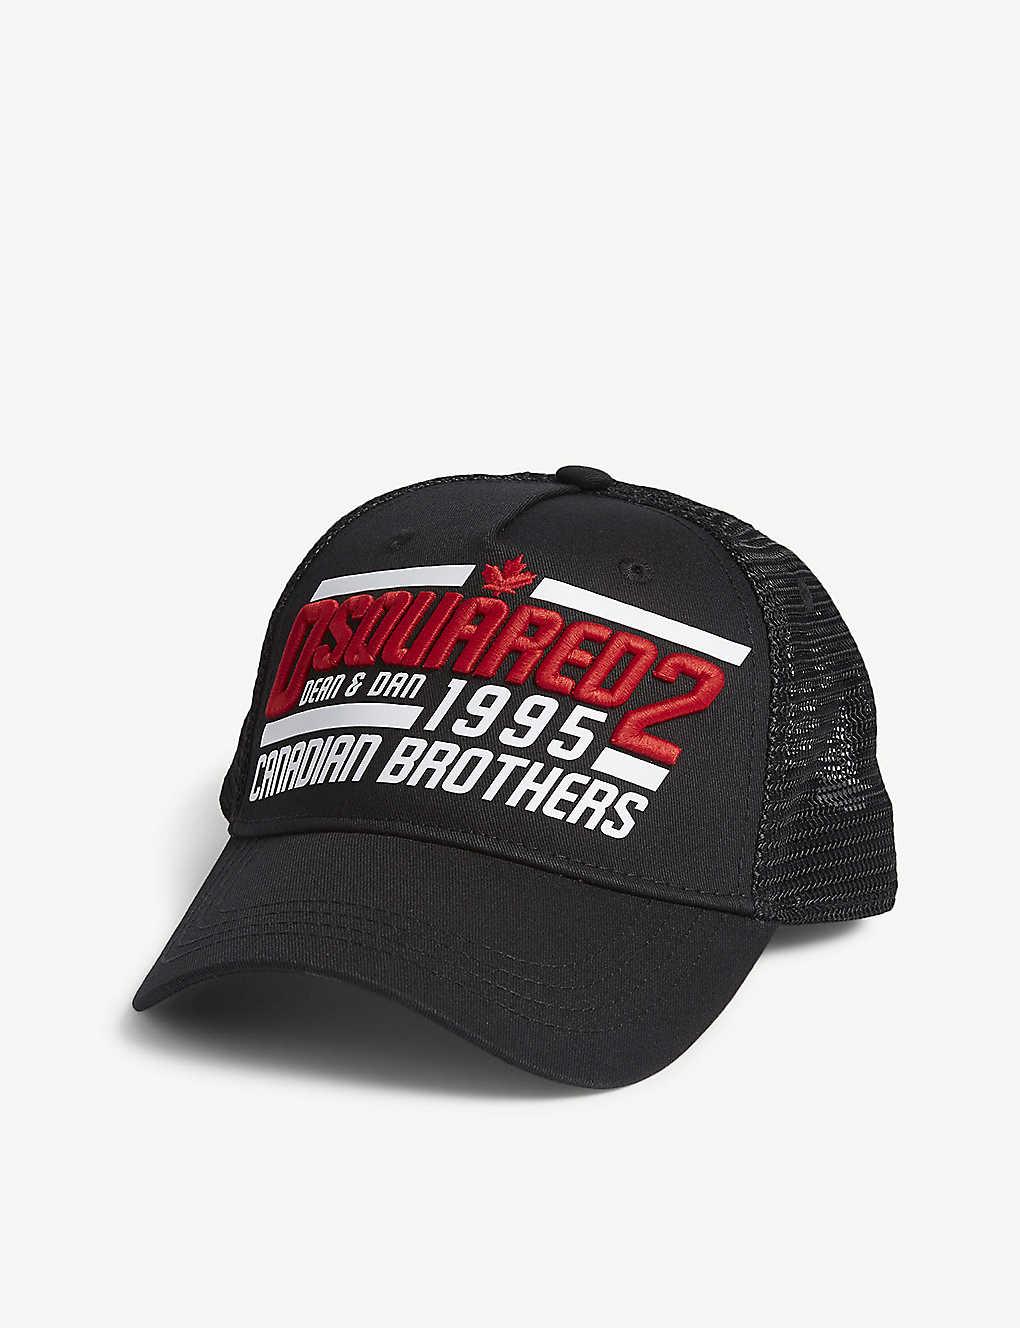 30394f7db3ac4 DSQUARED2 - Canadian brother trucker cap